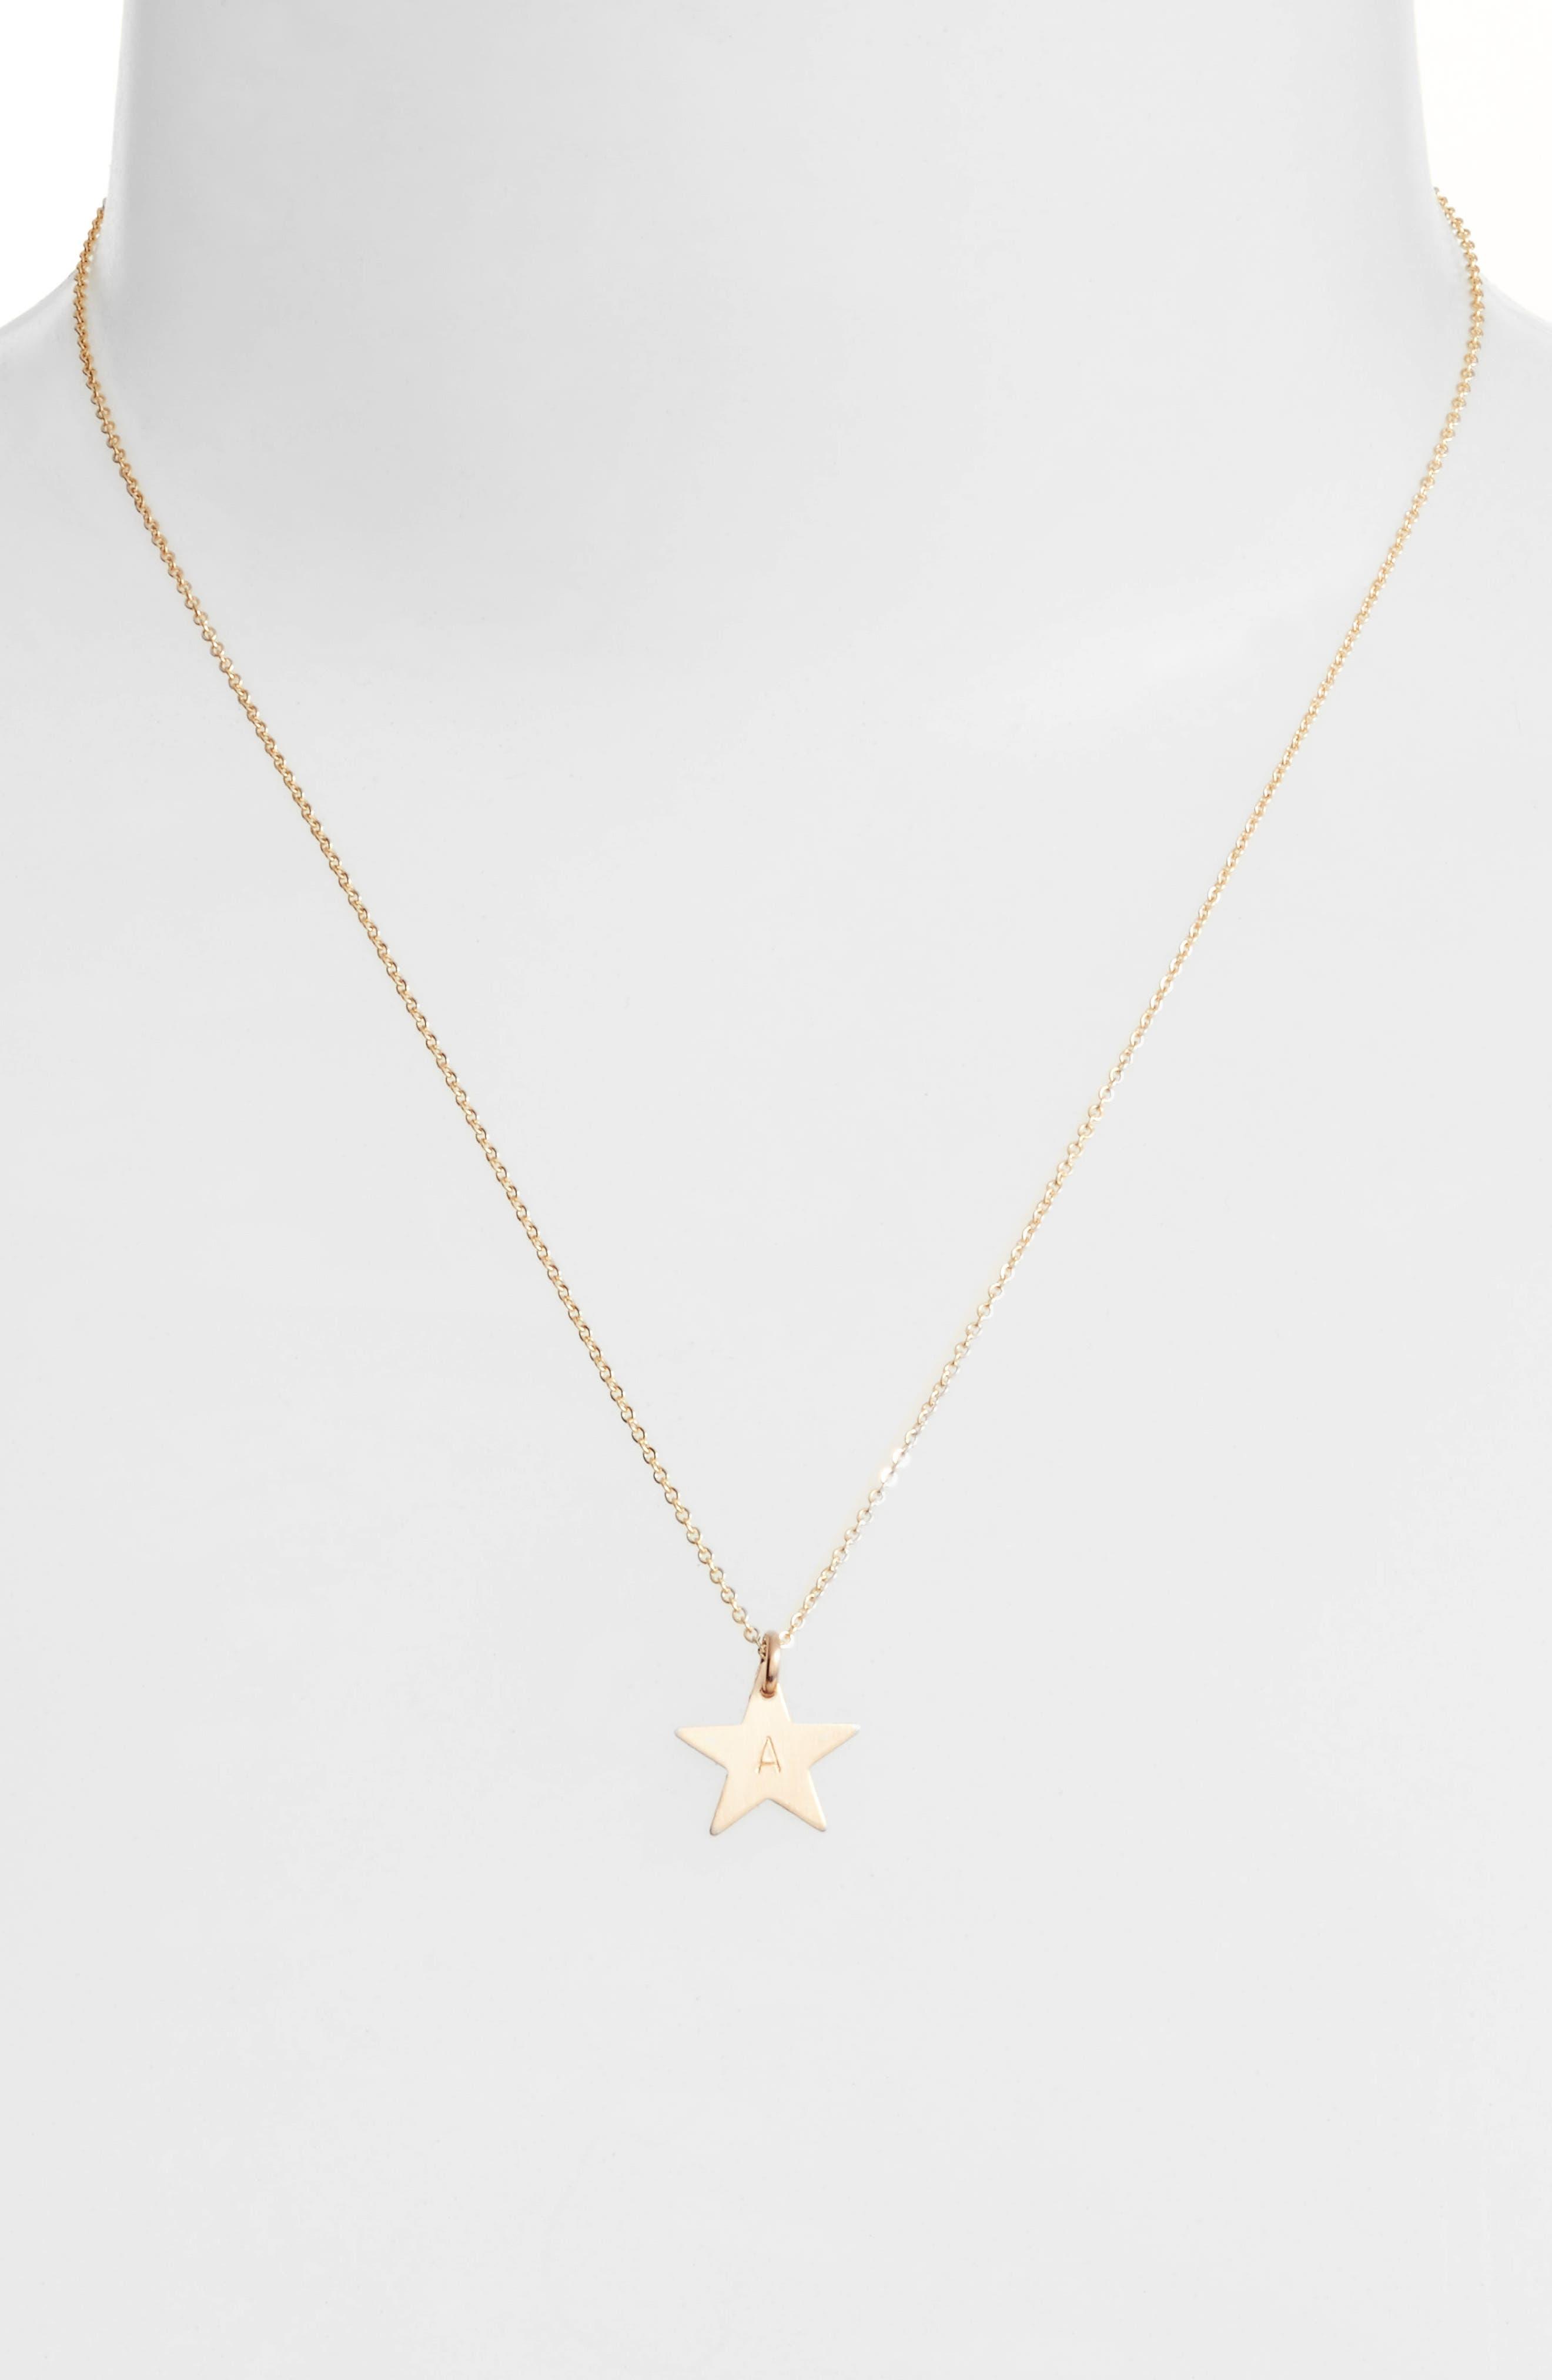 14k-Gold Fill Initial Mini Star Pendant Necklace,                             Alternate thumbnail 2, color,                             710